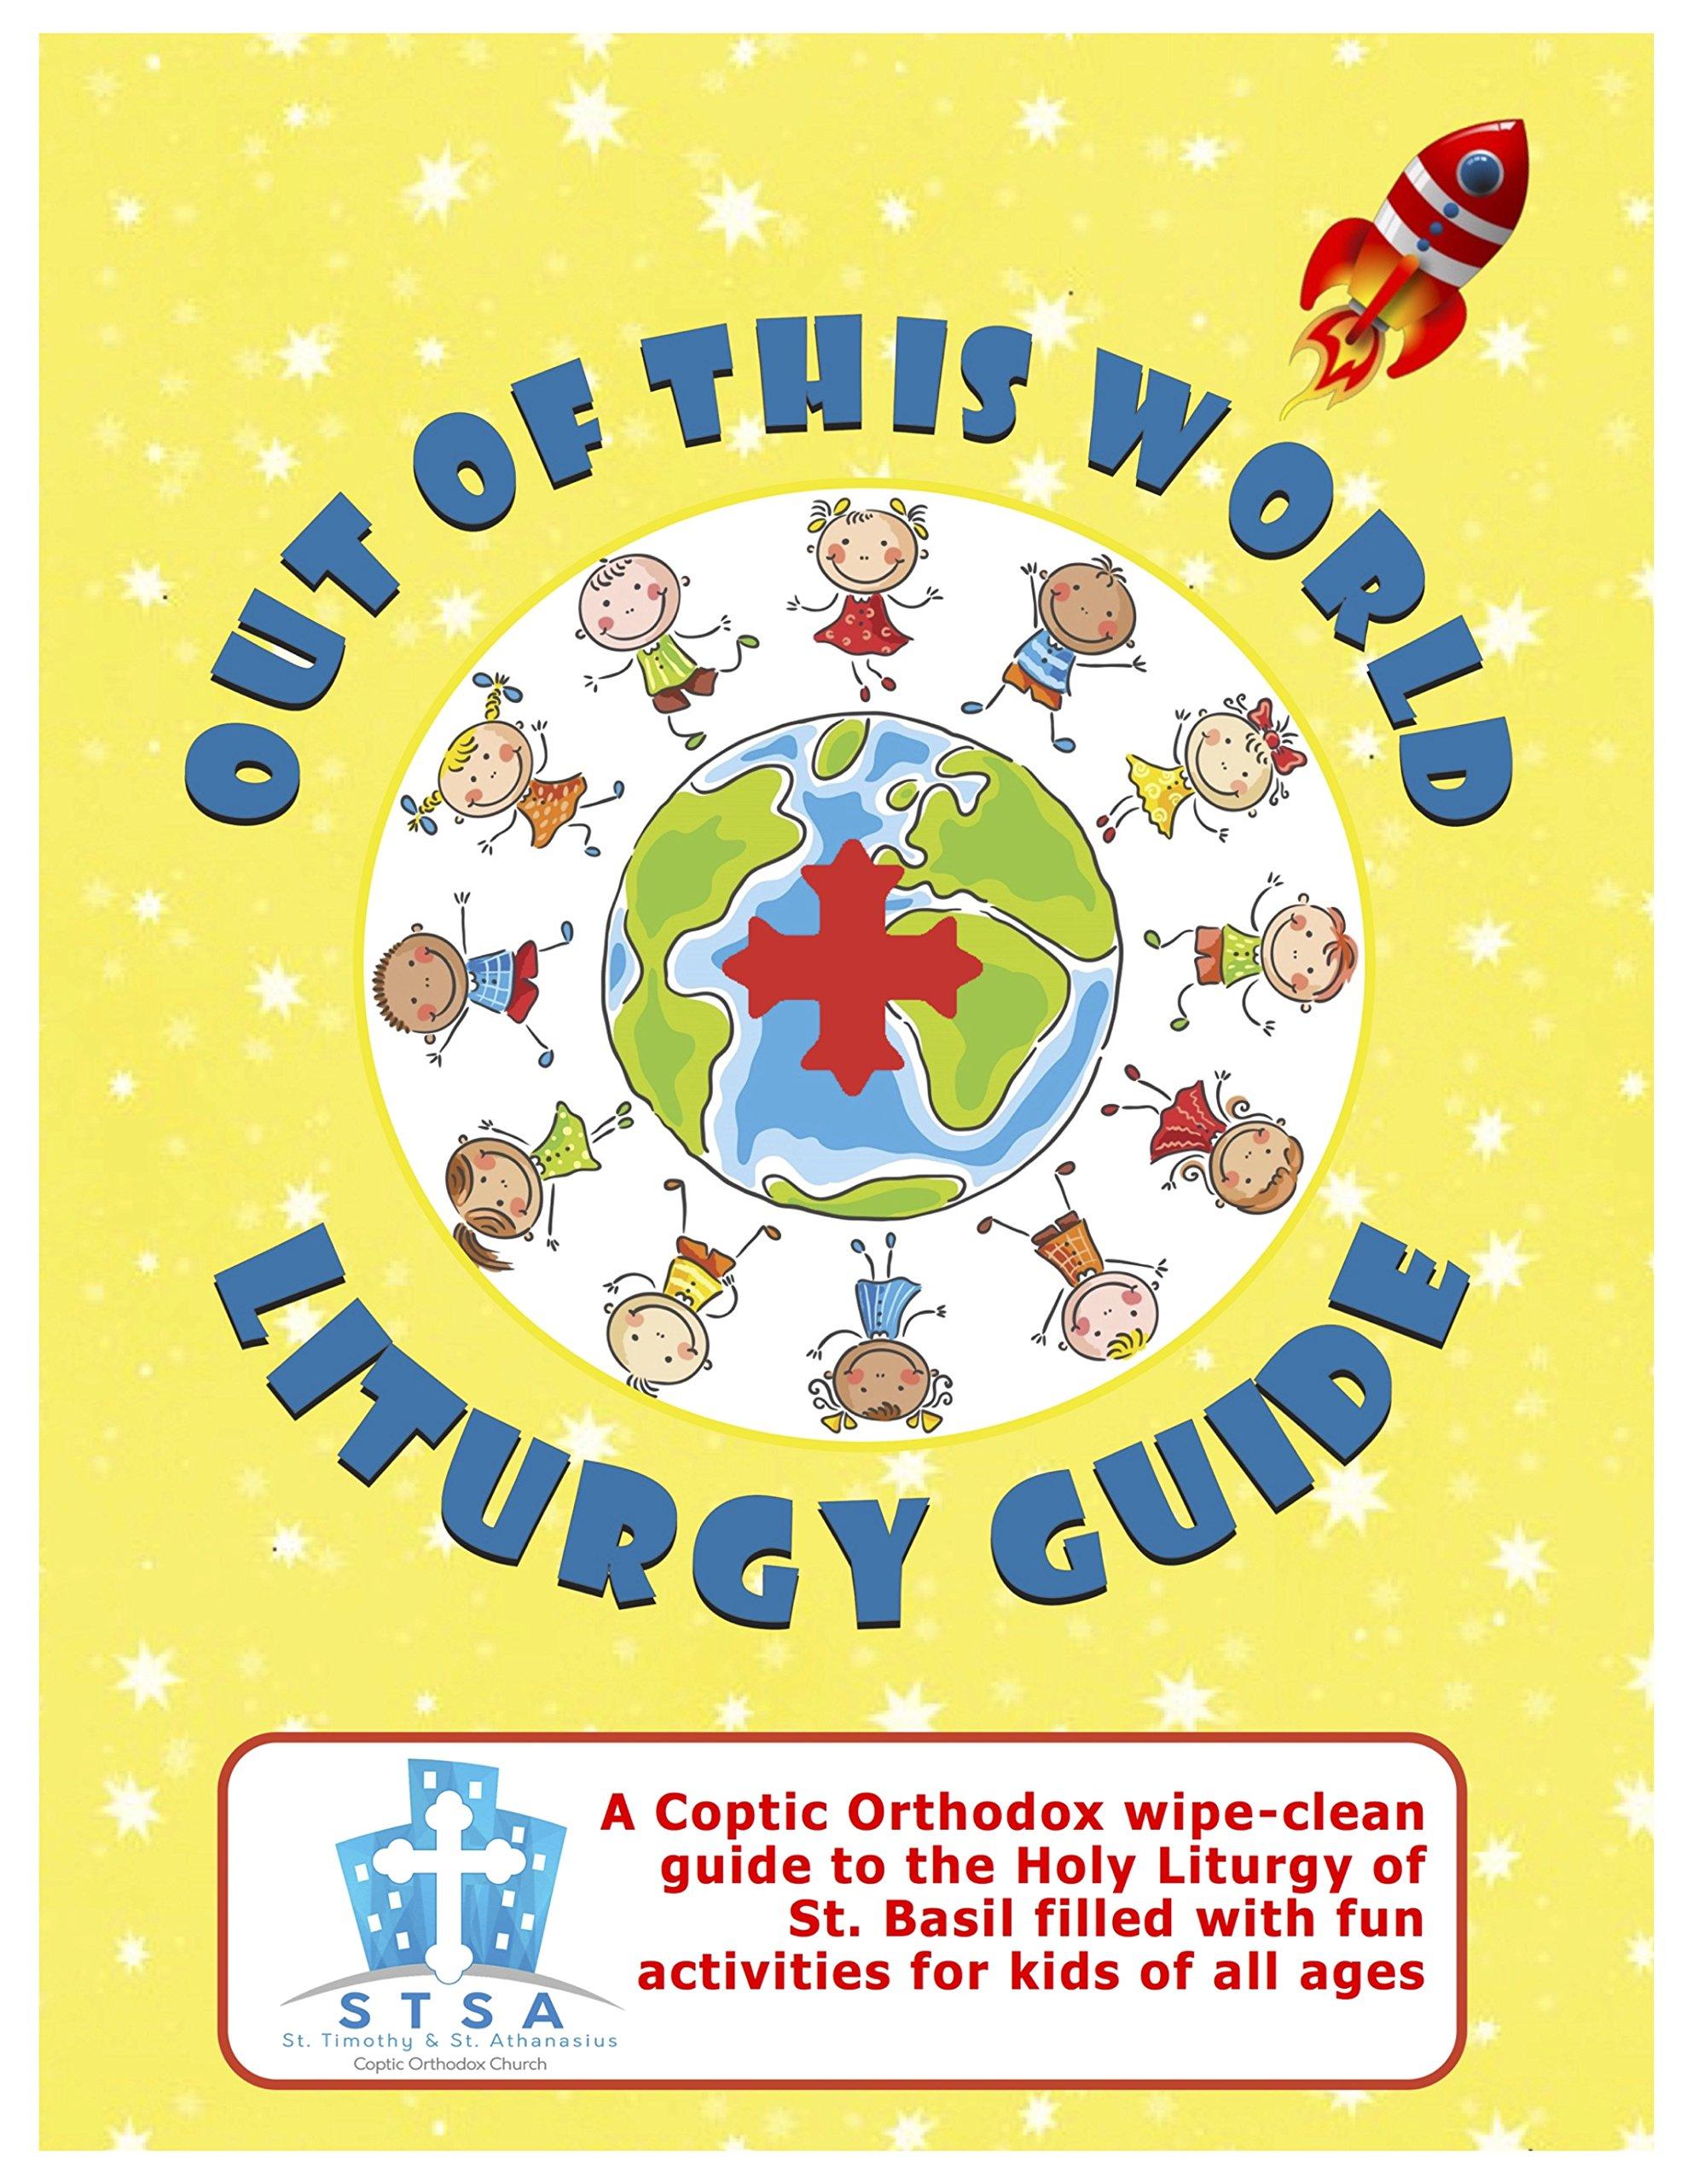 liturgy guide.jpg